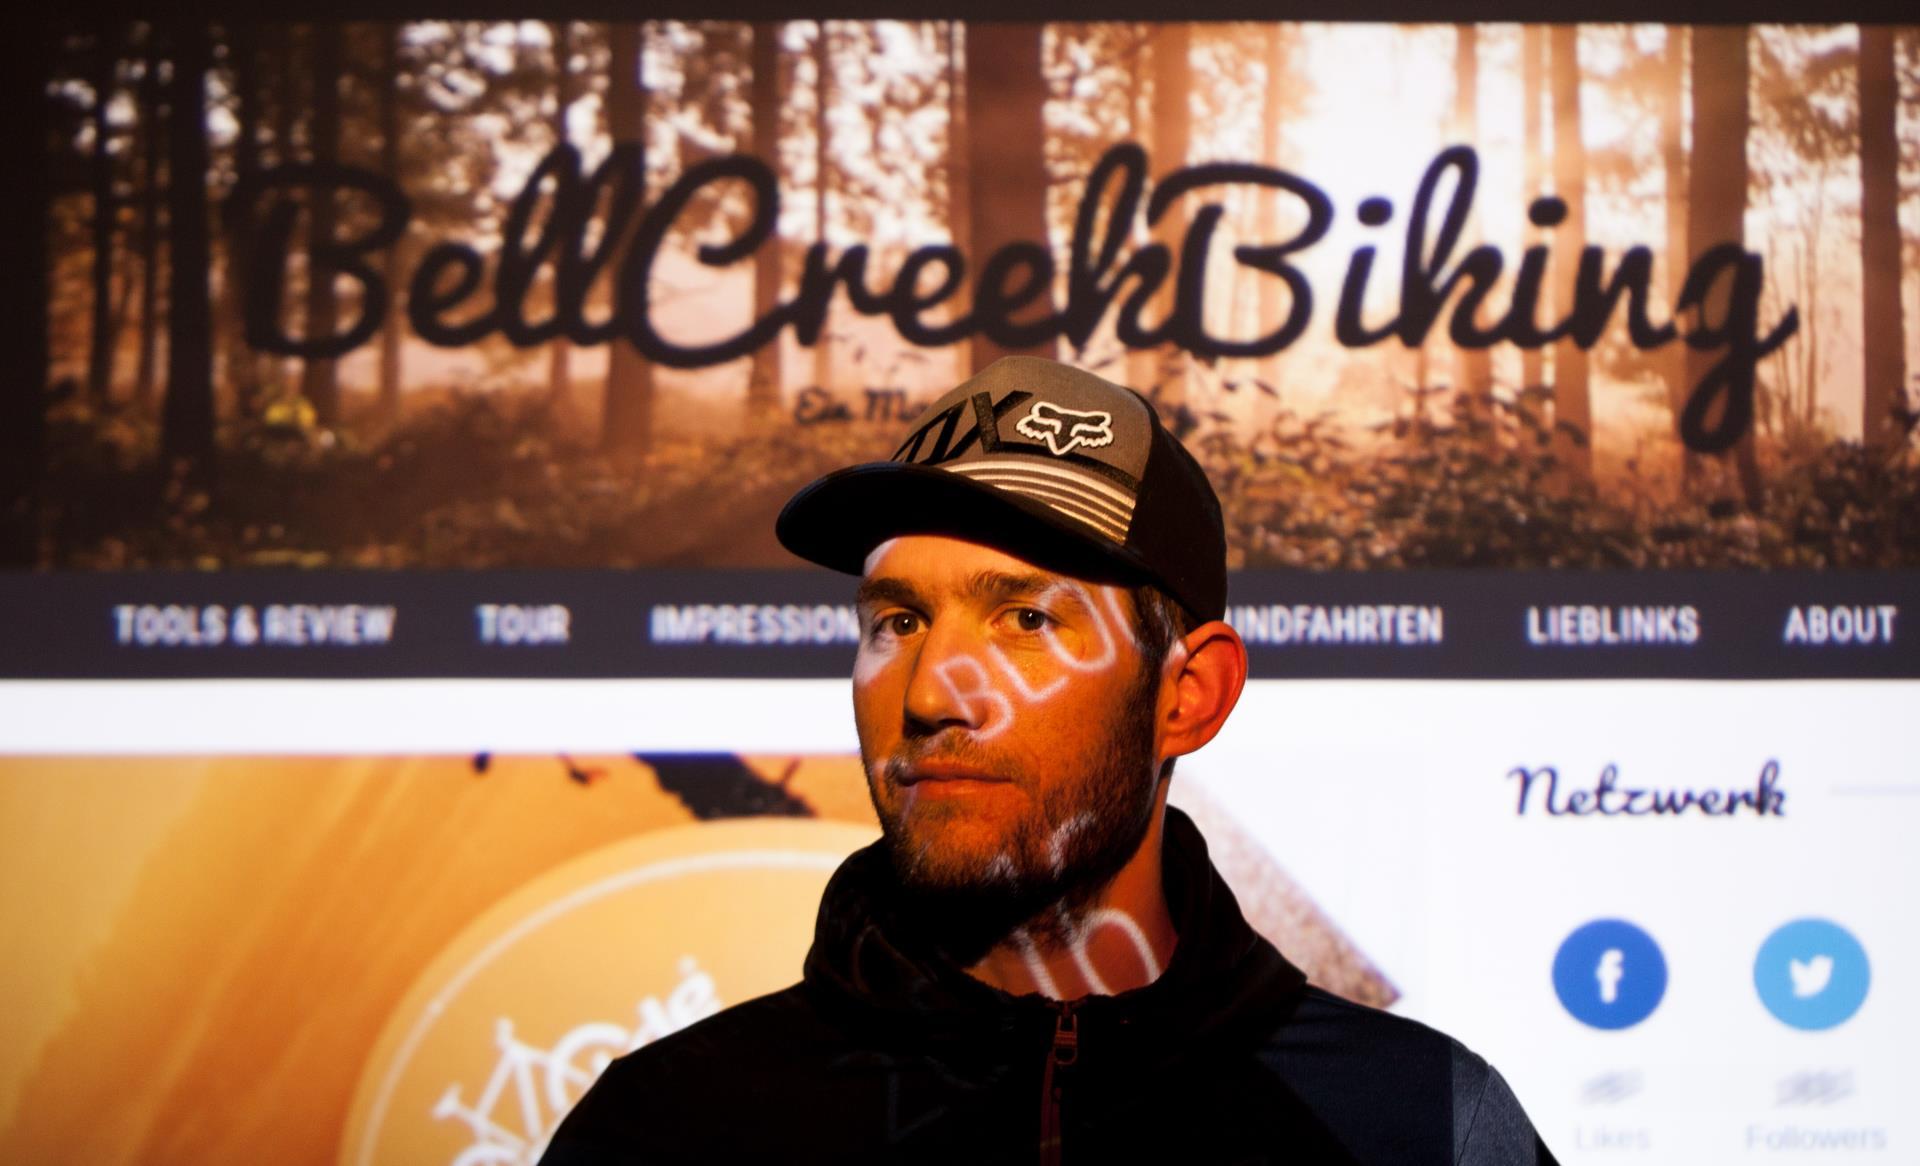 Interview mit Blogger bellcreekbiking.de